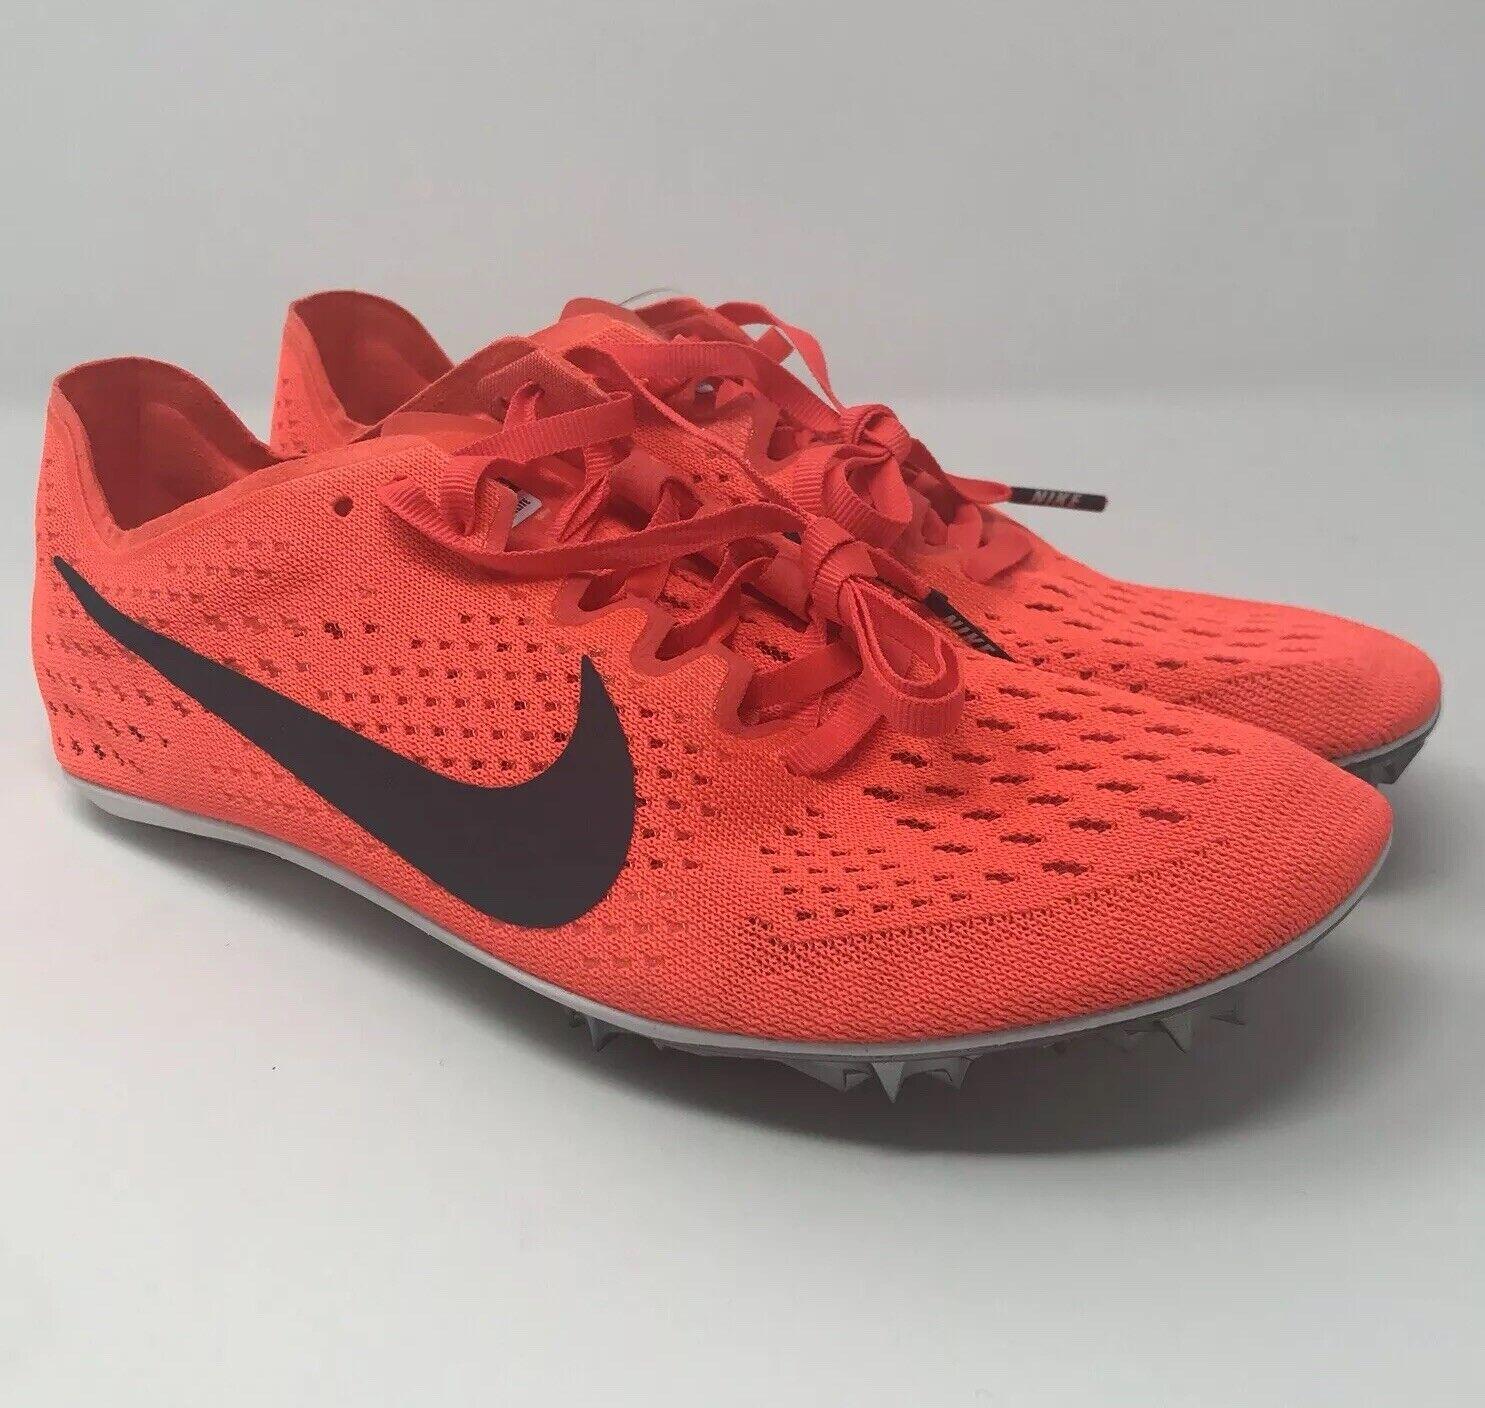 Nike Zoom Victory Elite 2 Track shoes w  Spikes Men's Crimson 835998-614 Sz 6.5